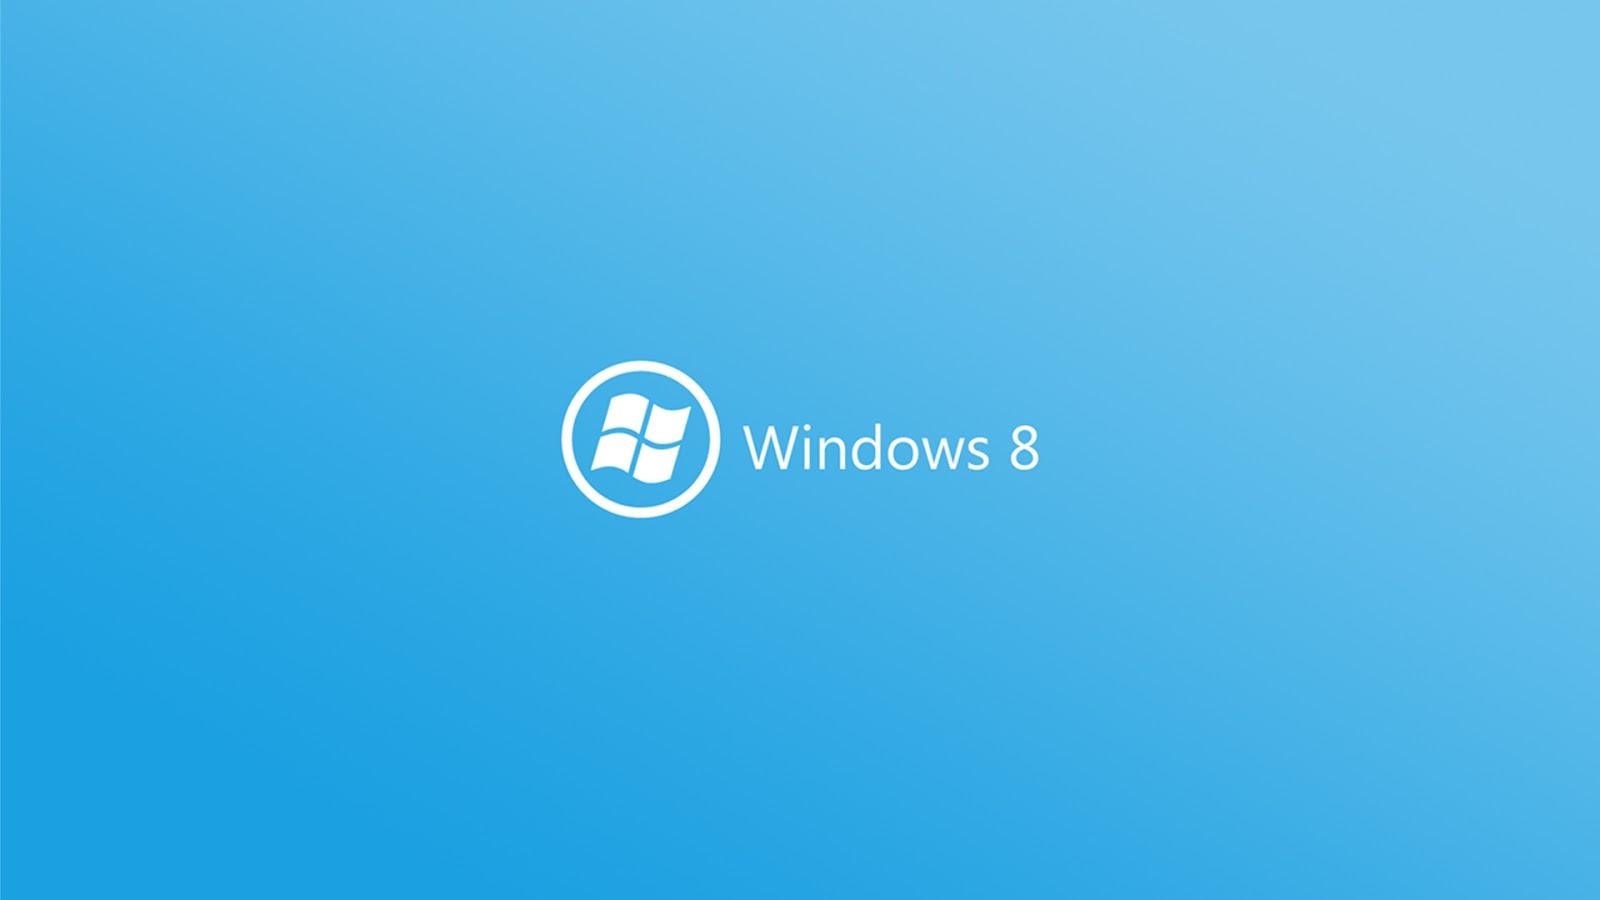 Windows 8 Full Hd Wallpapers 1080p